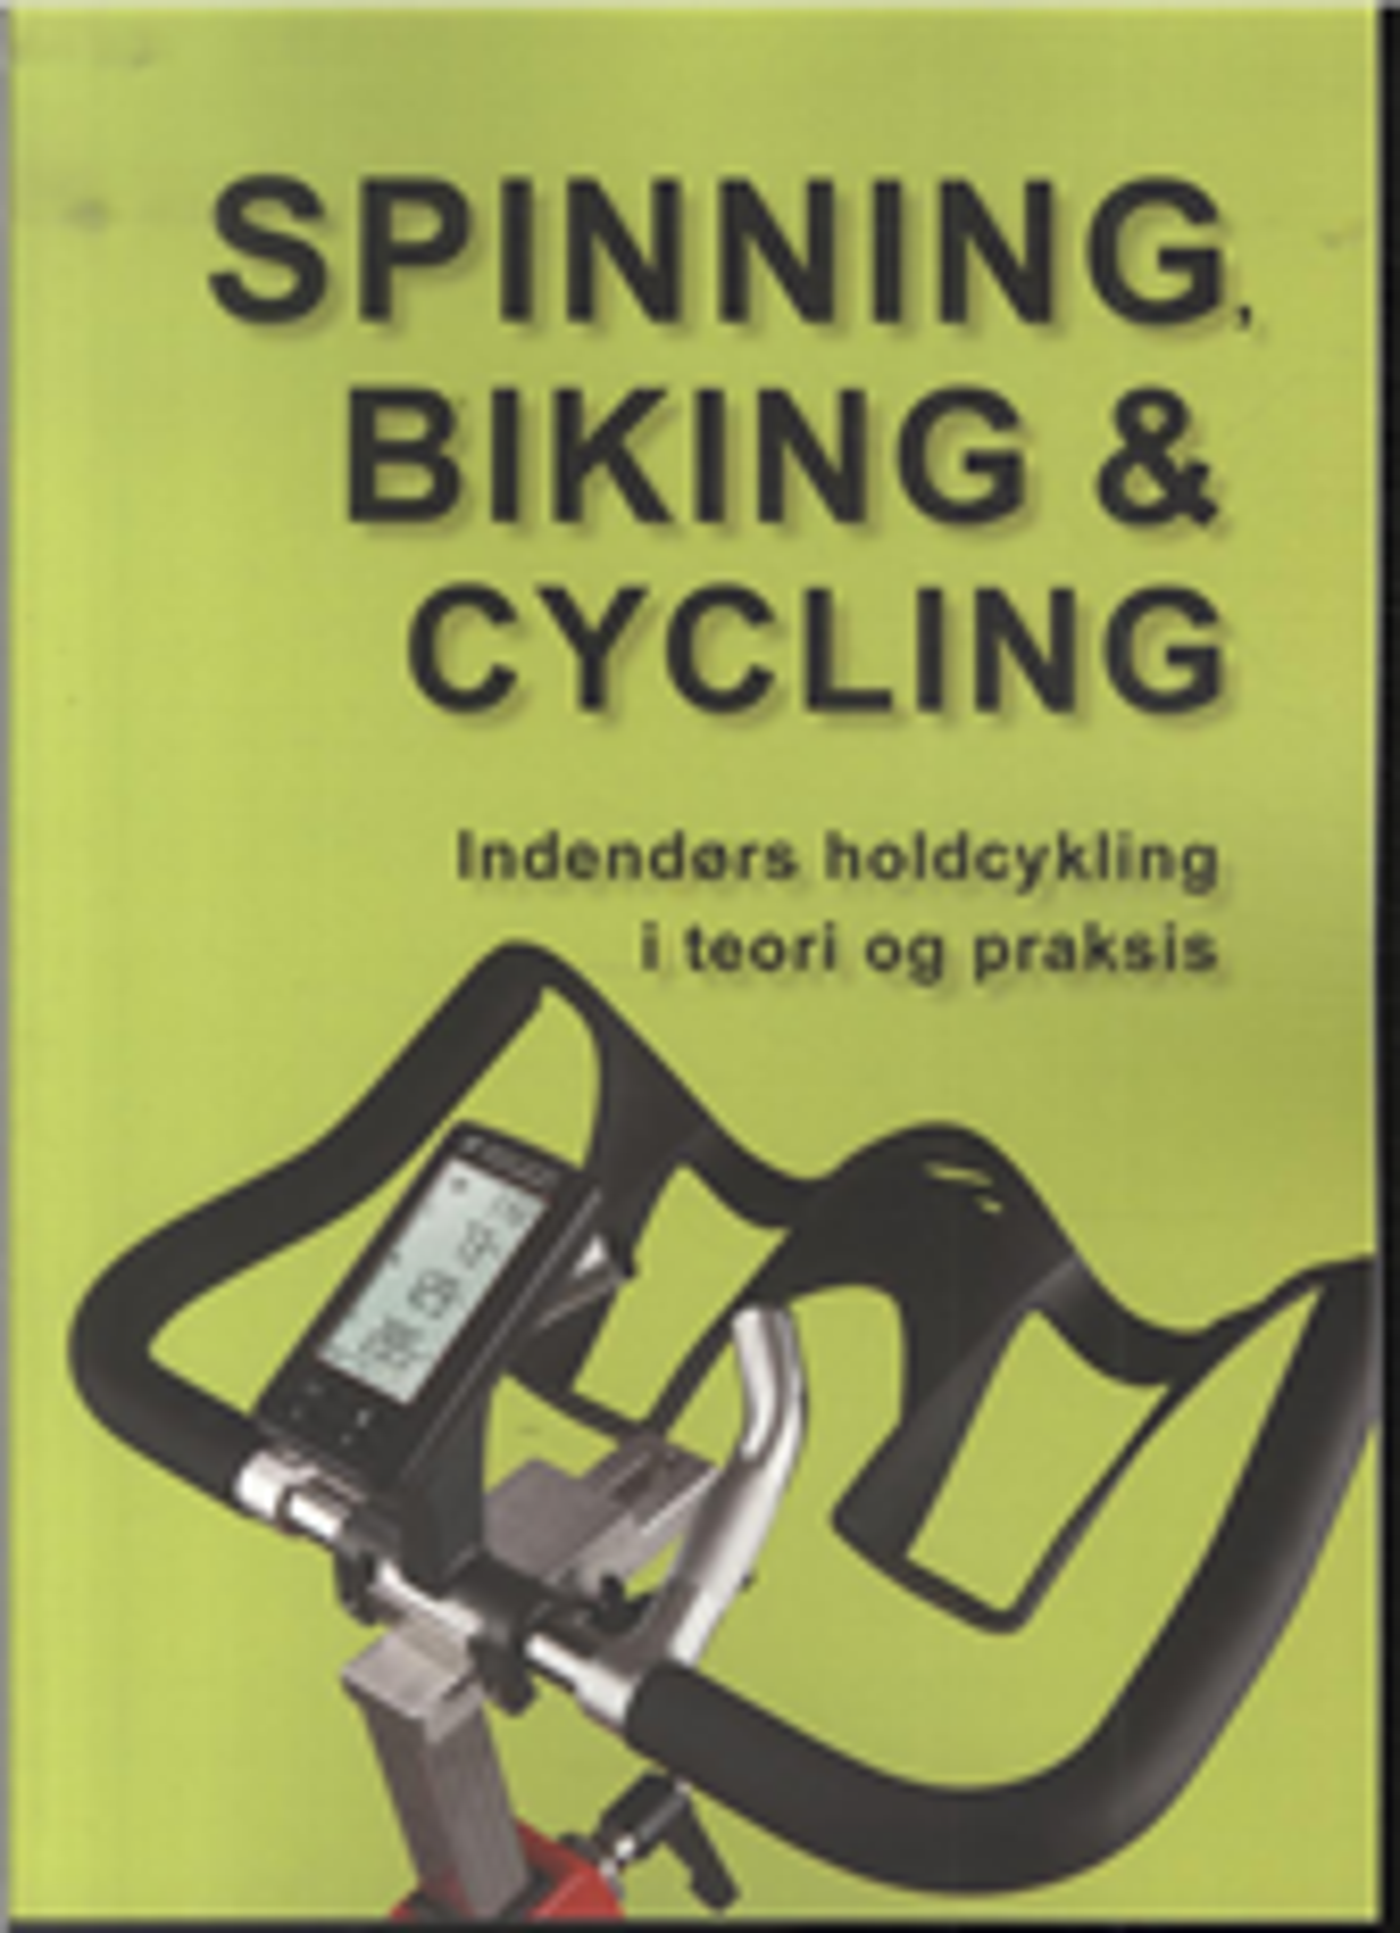 Spinning, biking & cycling